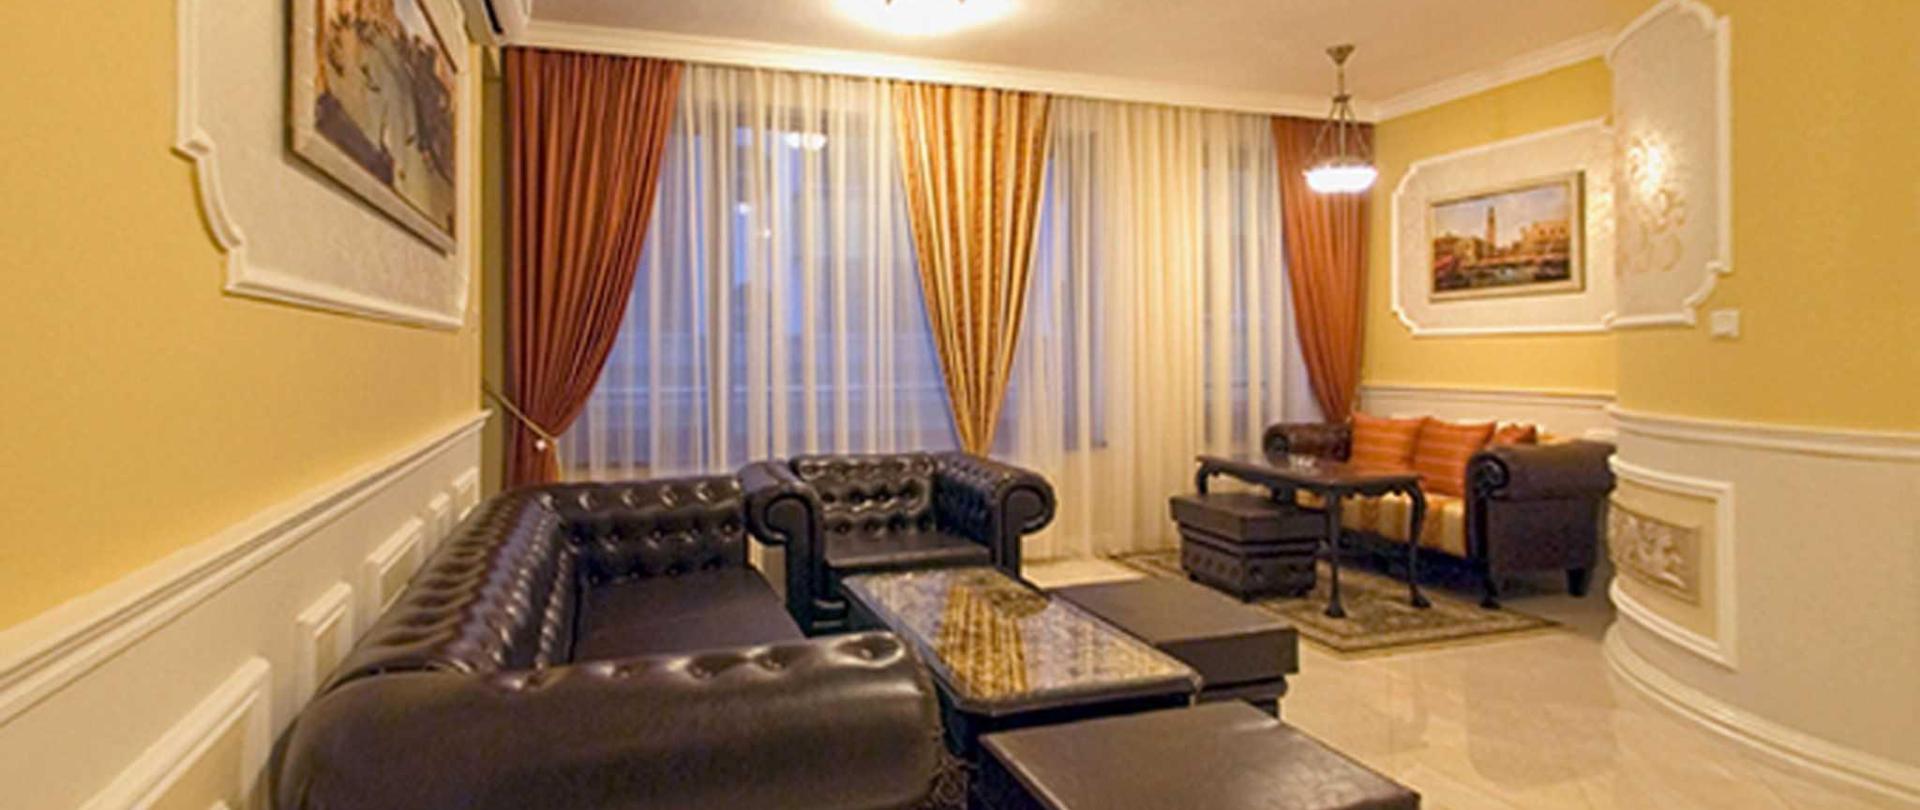 hotel_apartment_living_room_1-copy.jpg